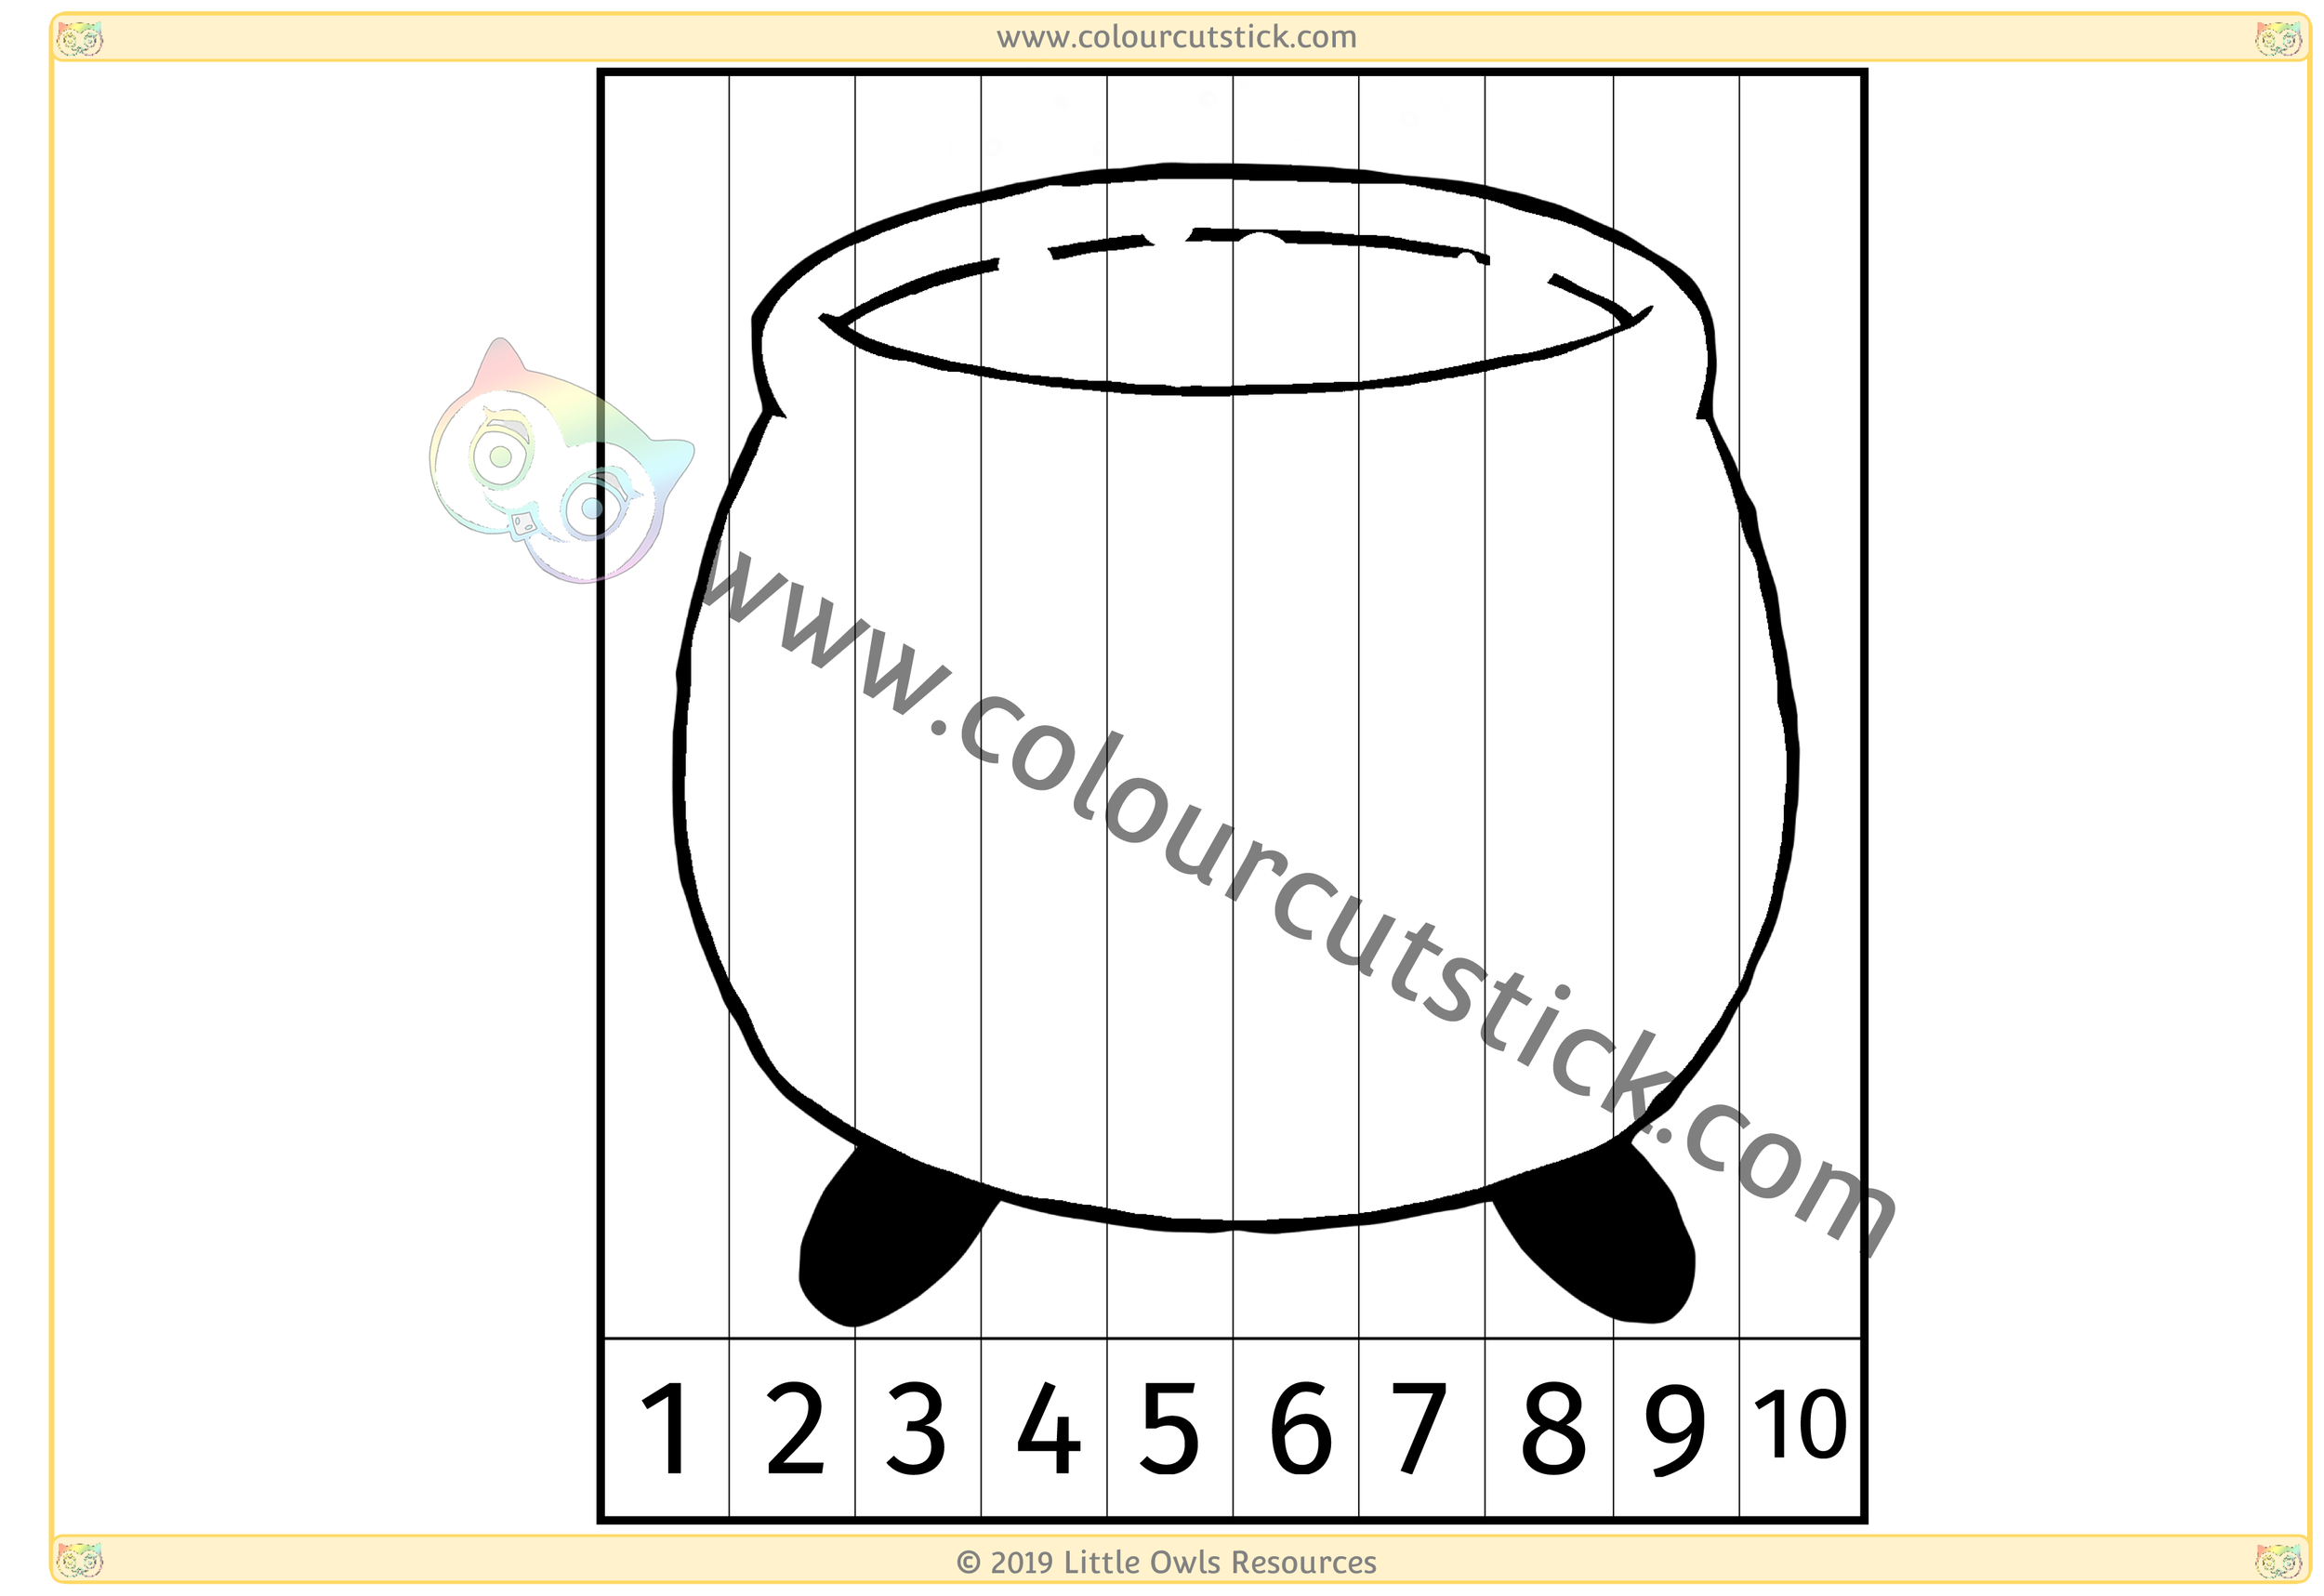 Cauldron Number Slice Puzzle 1-10 -